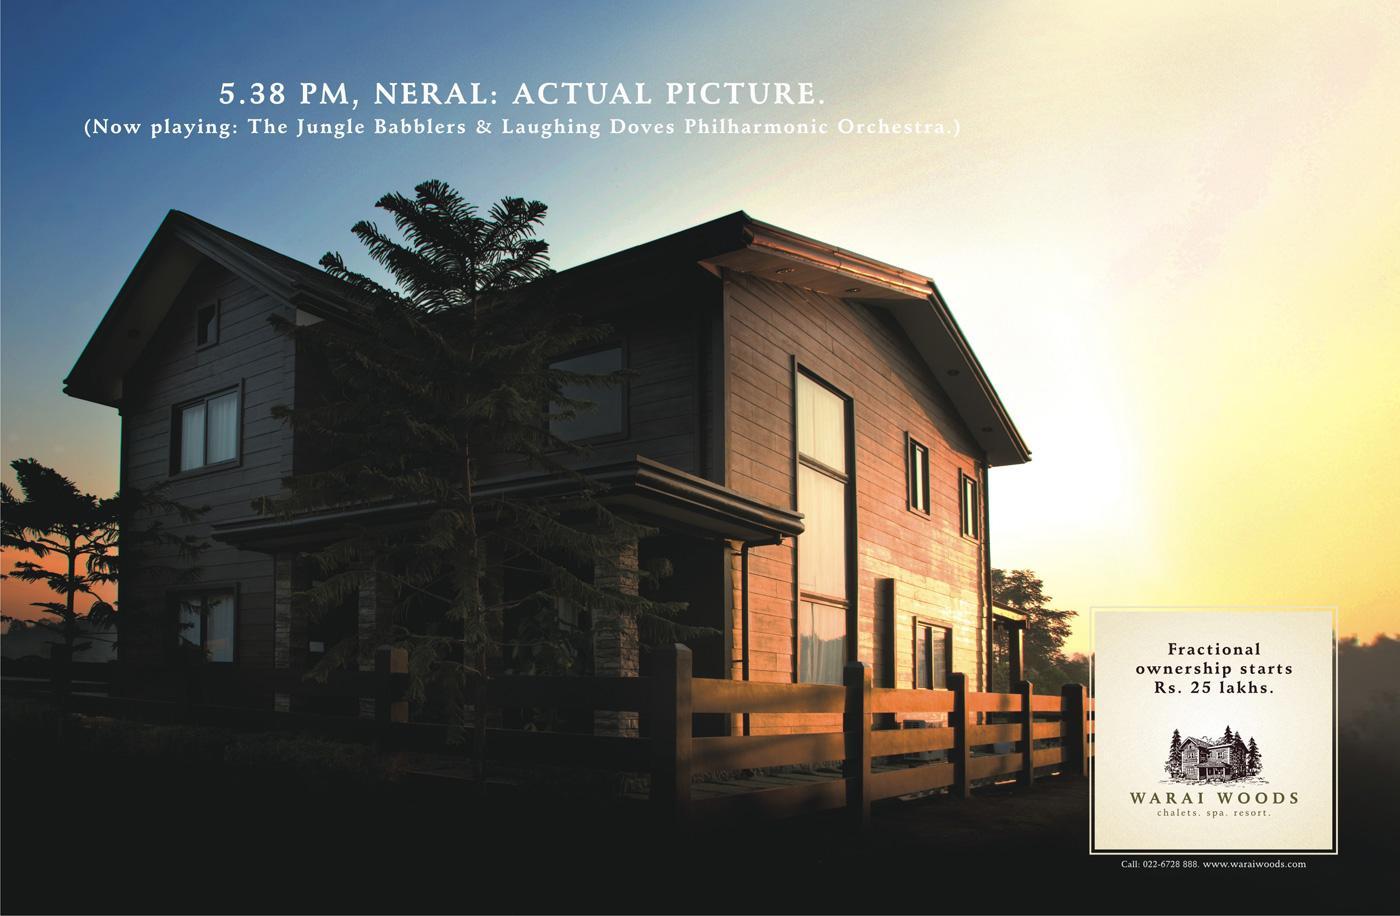 warai woods print advert by ideas work house 1 ads of the world